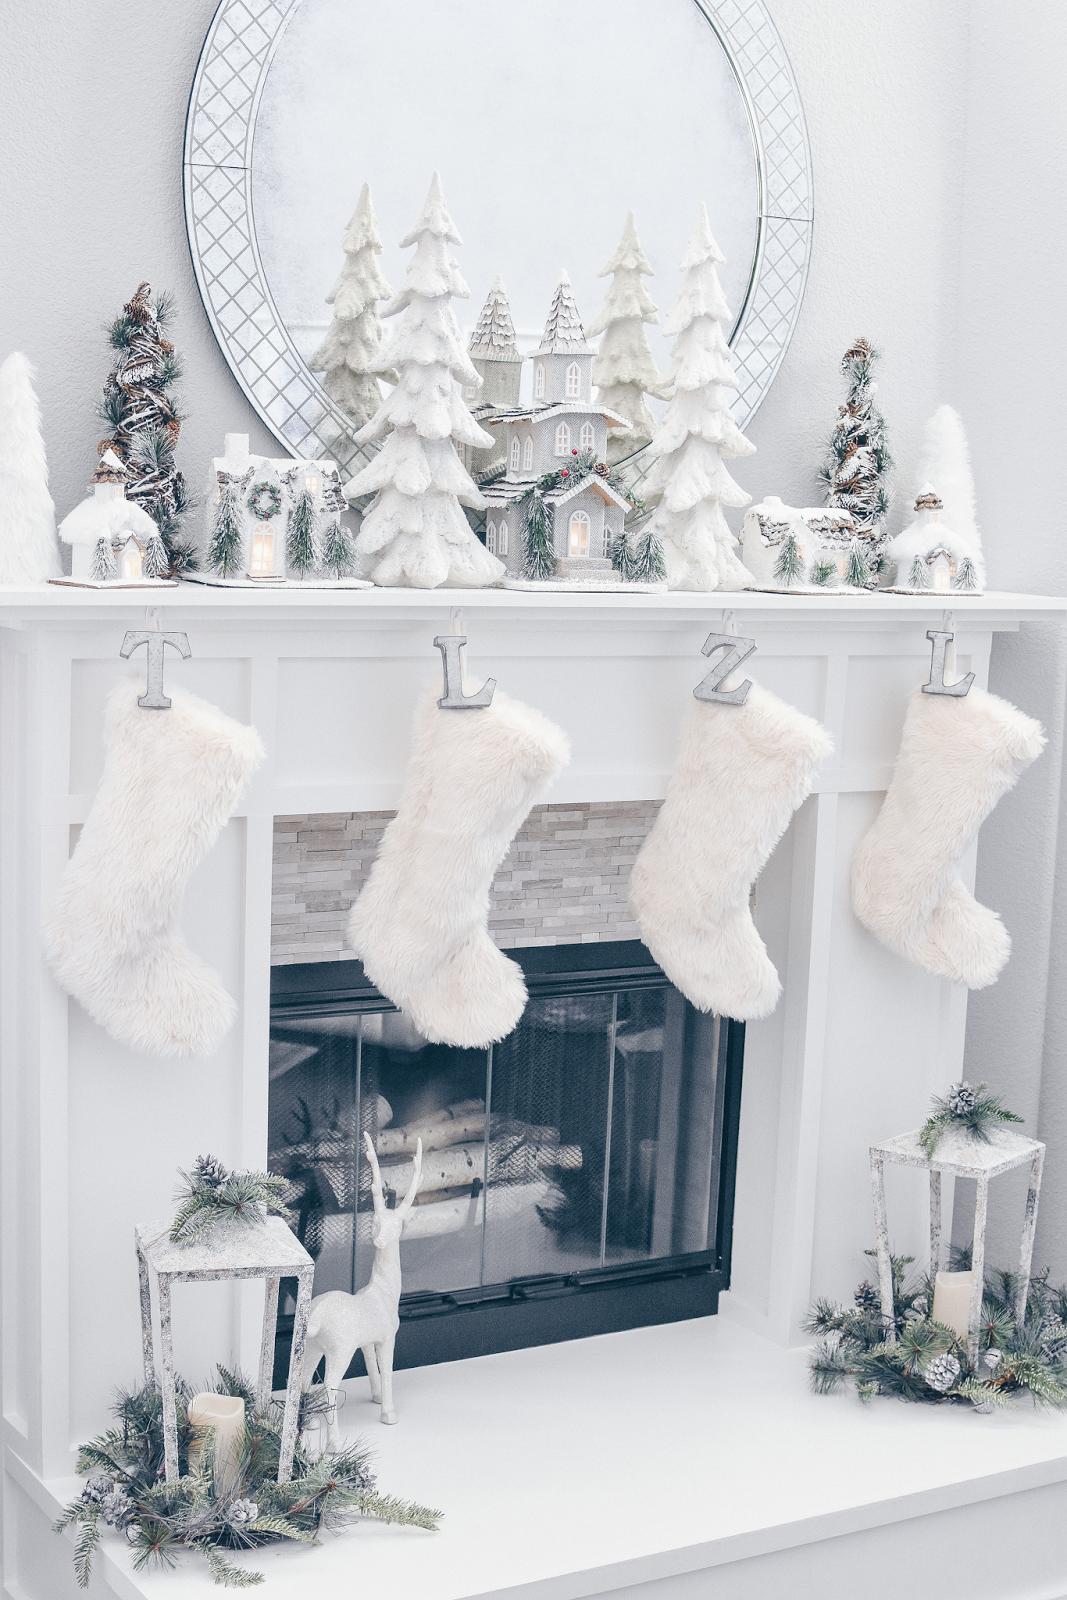 White Christmas Decor Christmas Fireplace Mantel Christmas Mantel Decorations White Christmas Decor Christmas Decor Diy